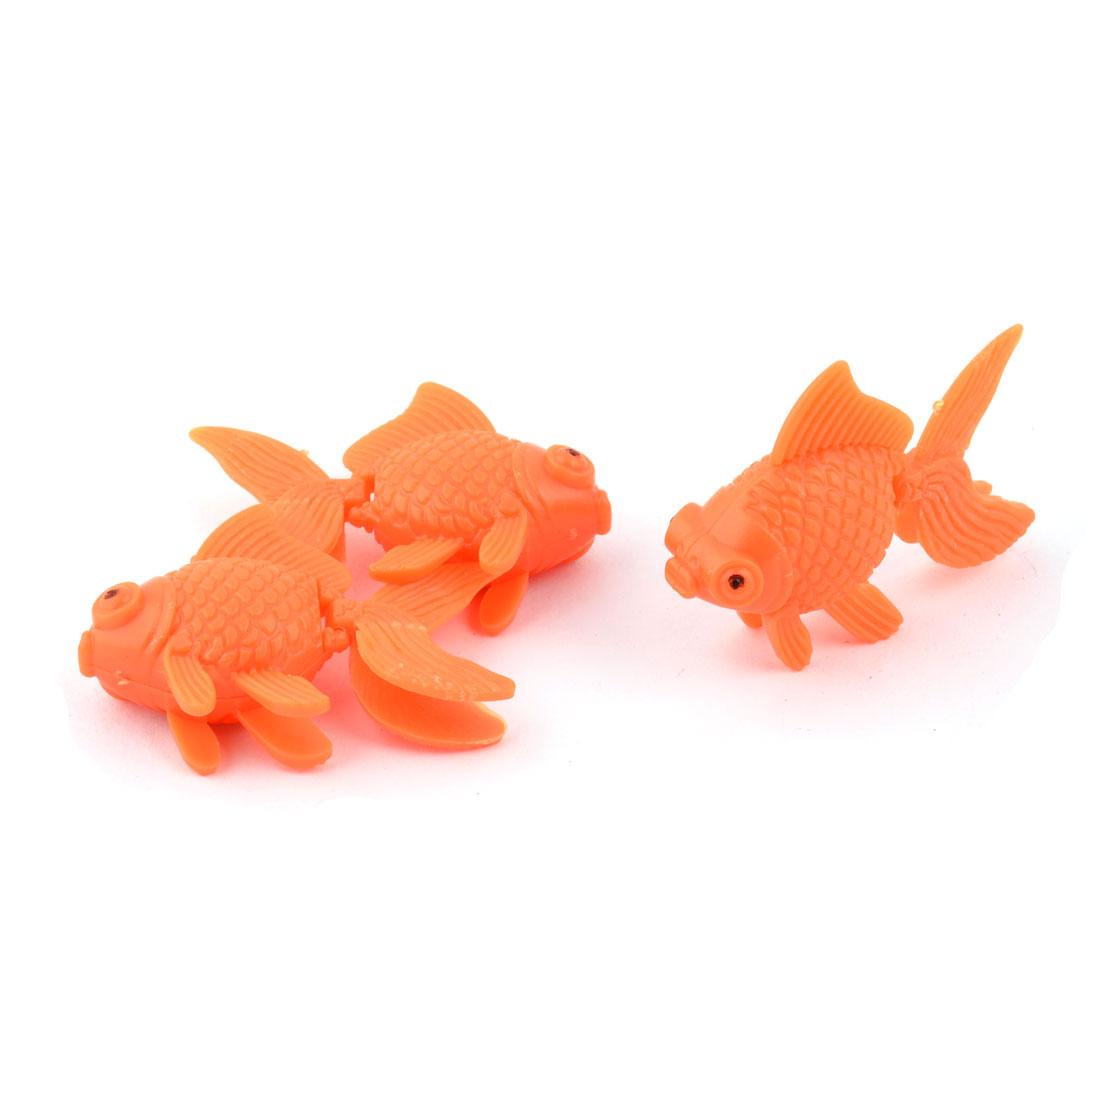 Aquarium Fish Tank Plastic Floating Goldfishes Decoration Ornament Orange 3pcs